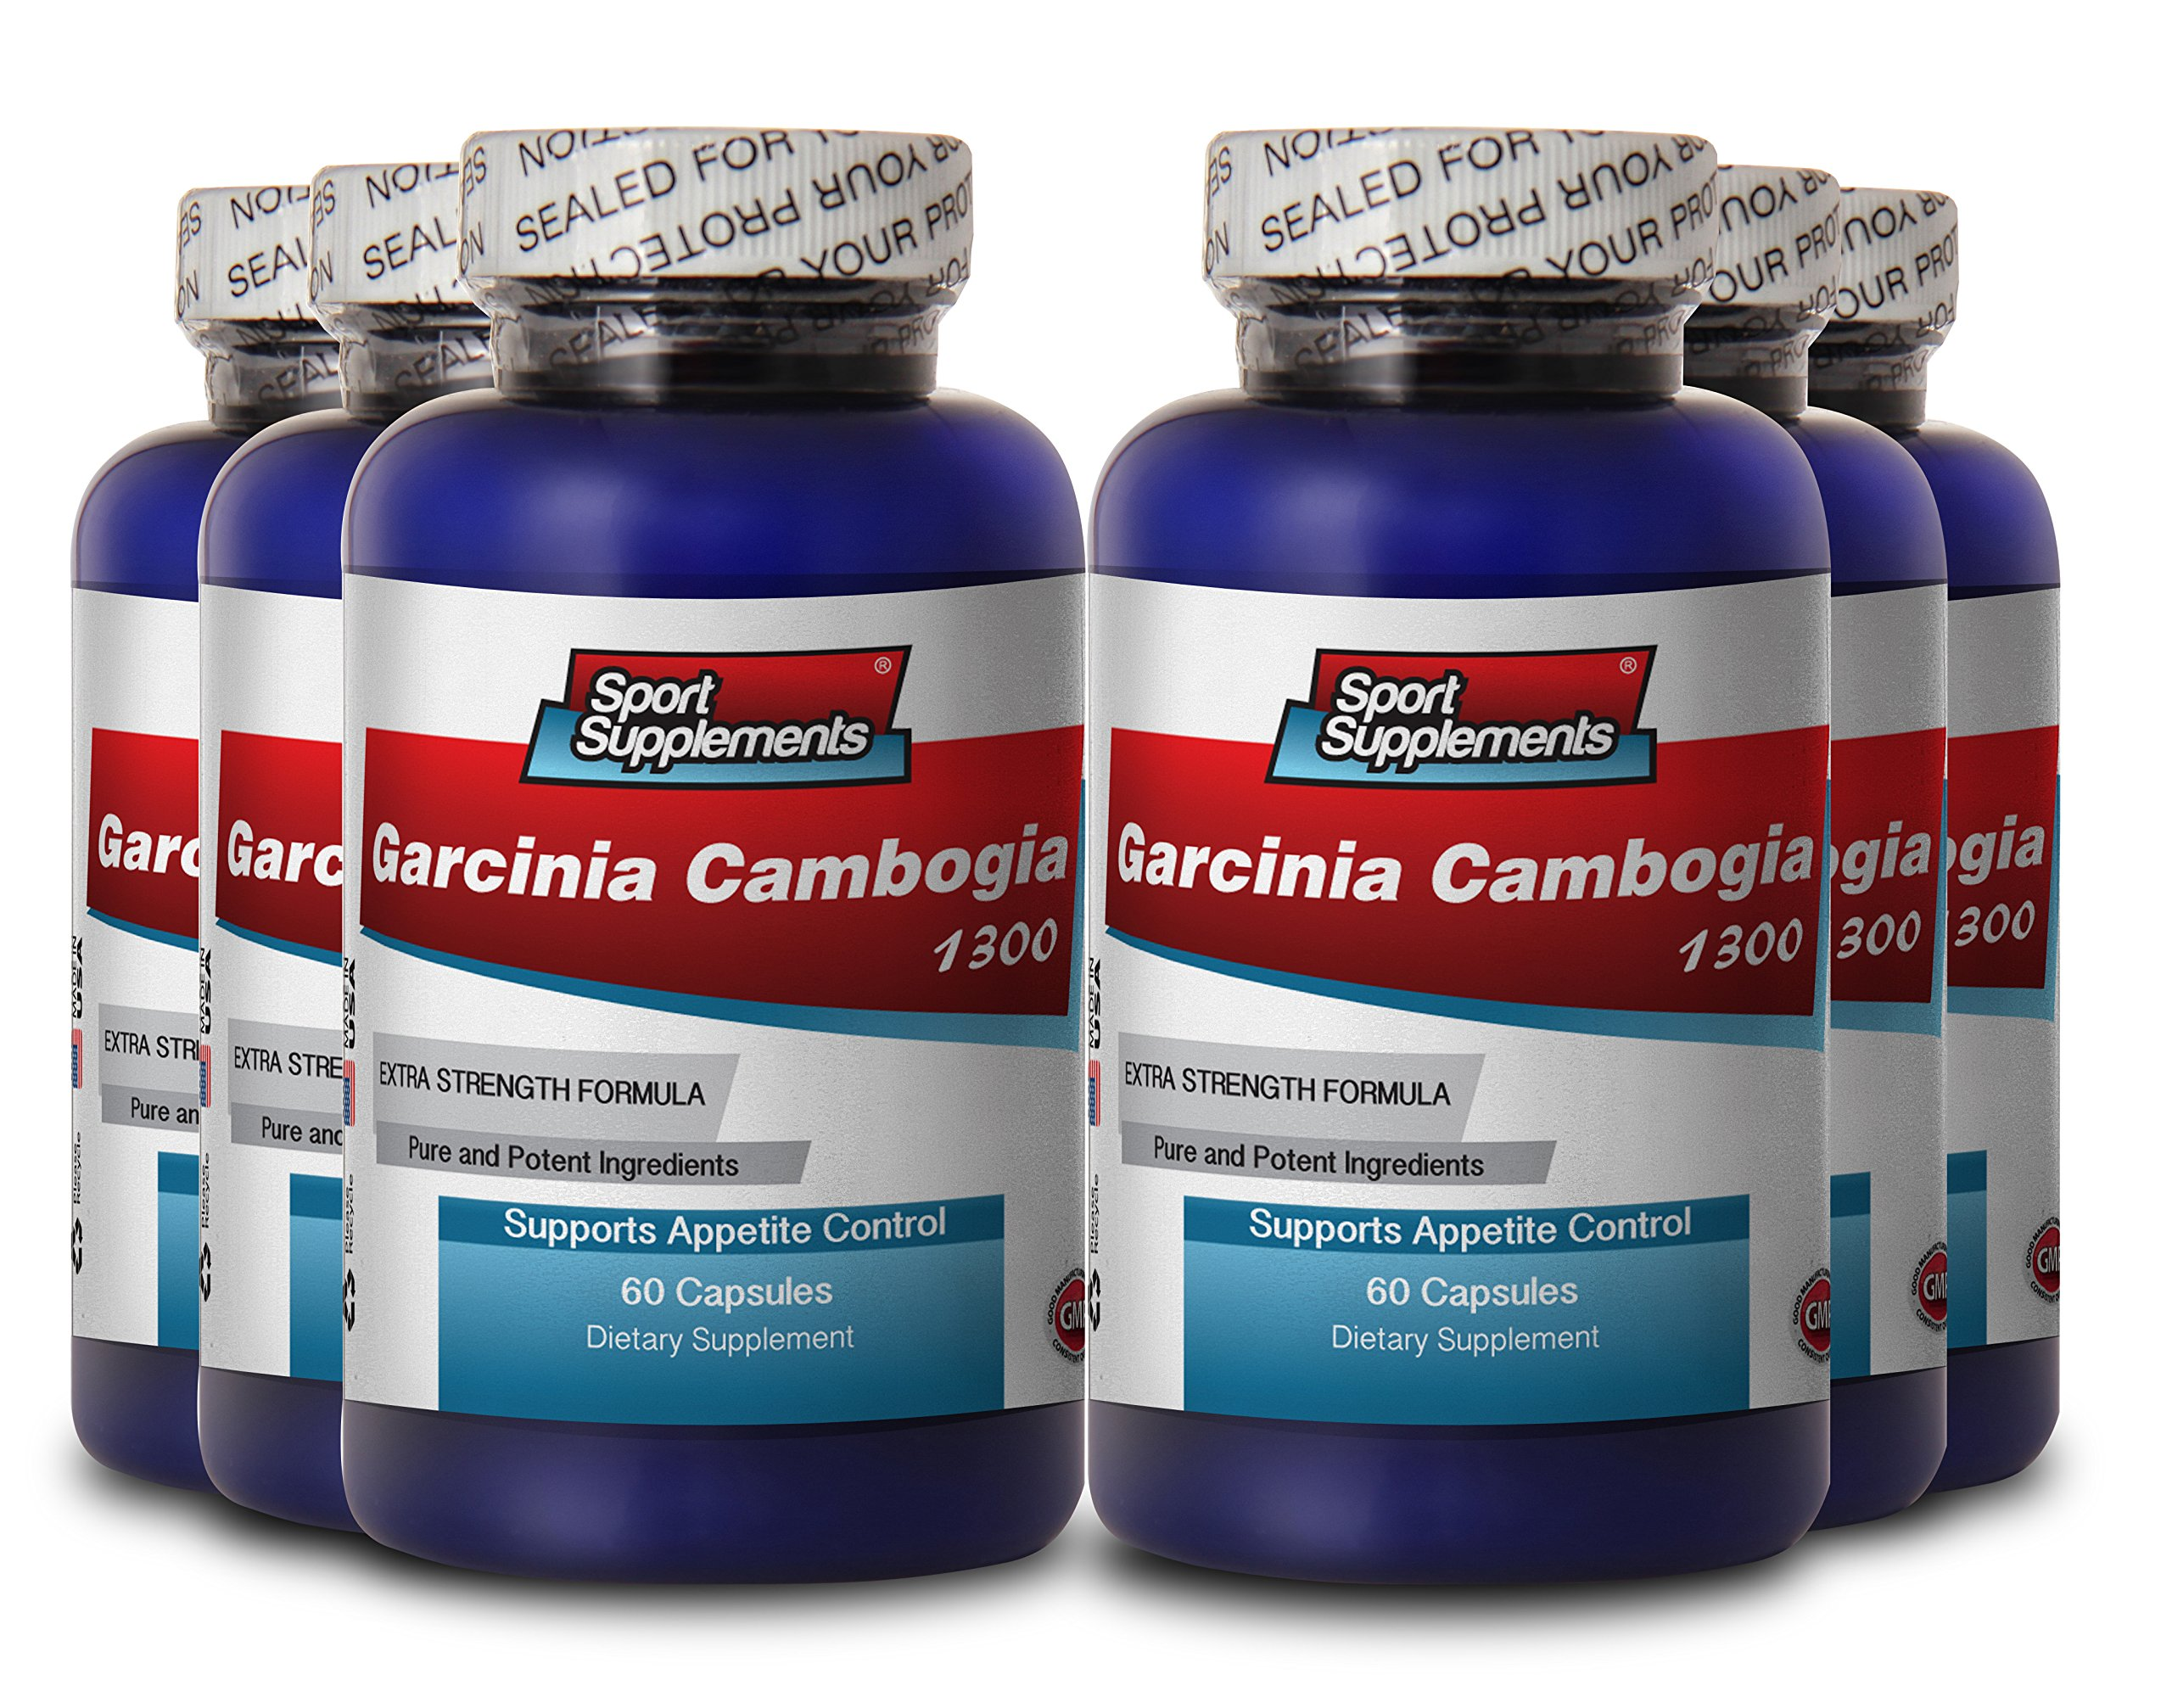 PURE GARCINIA CAMBOGIA PREMIUM EXTRACT 1300 - Fat loss supplements - 6 Bottles 360 Capsules